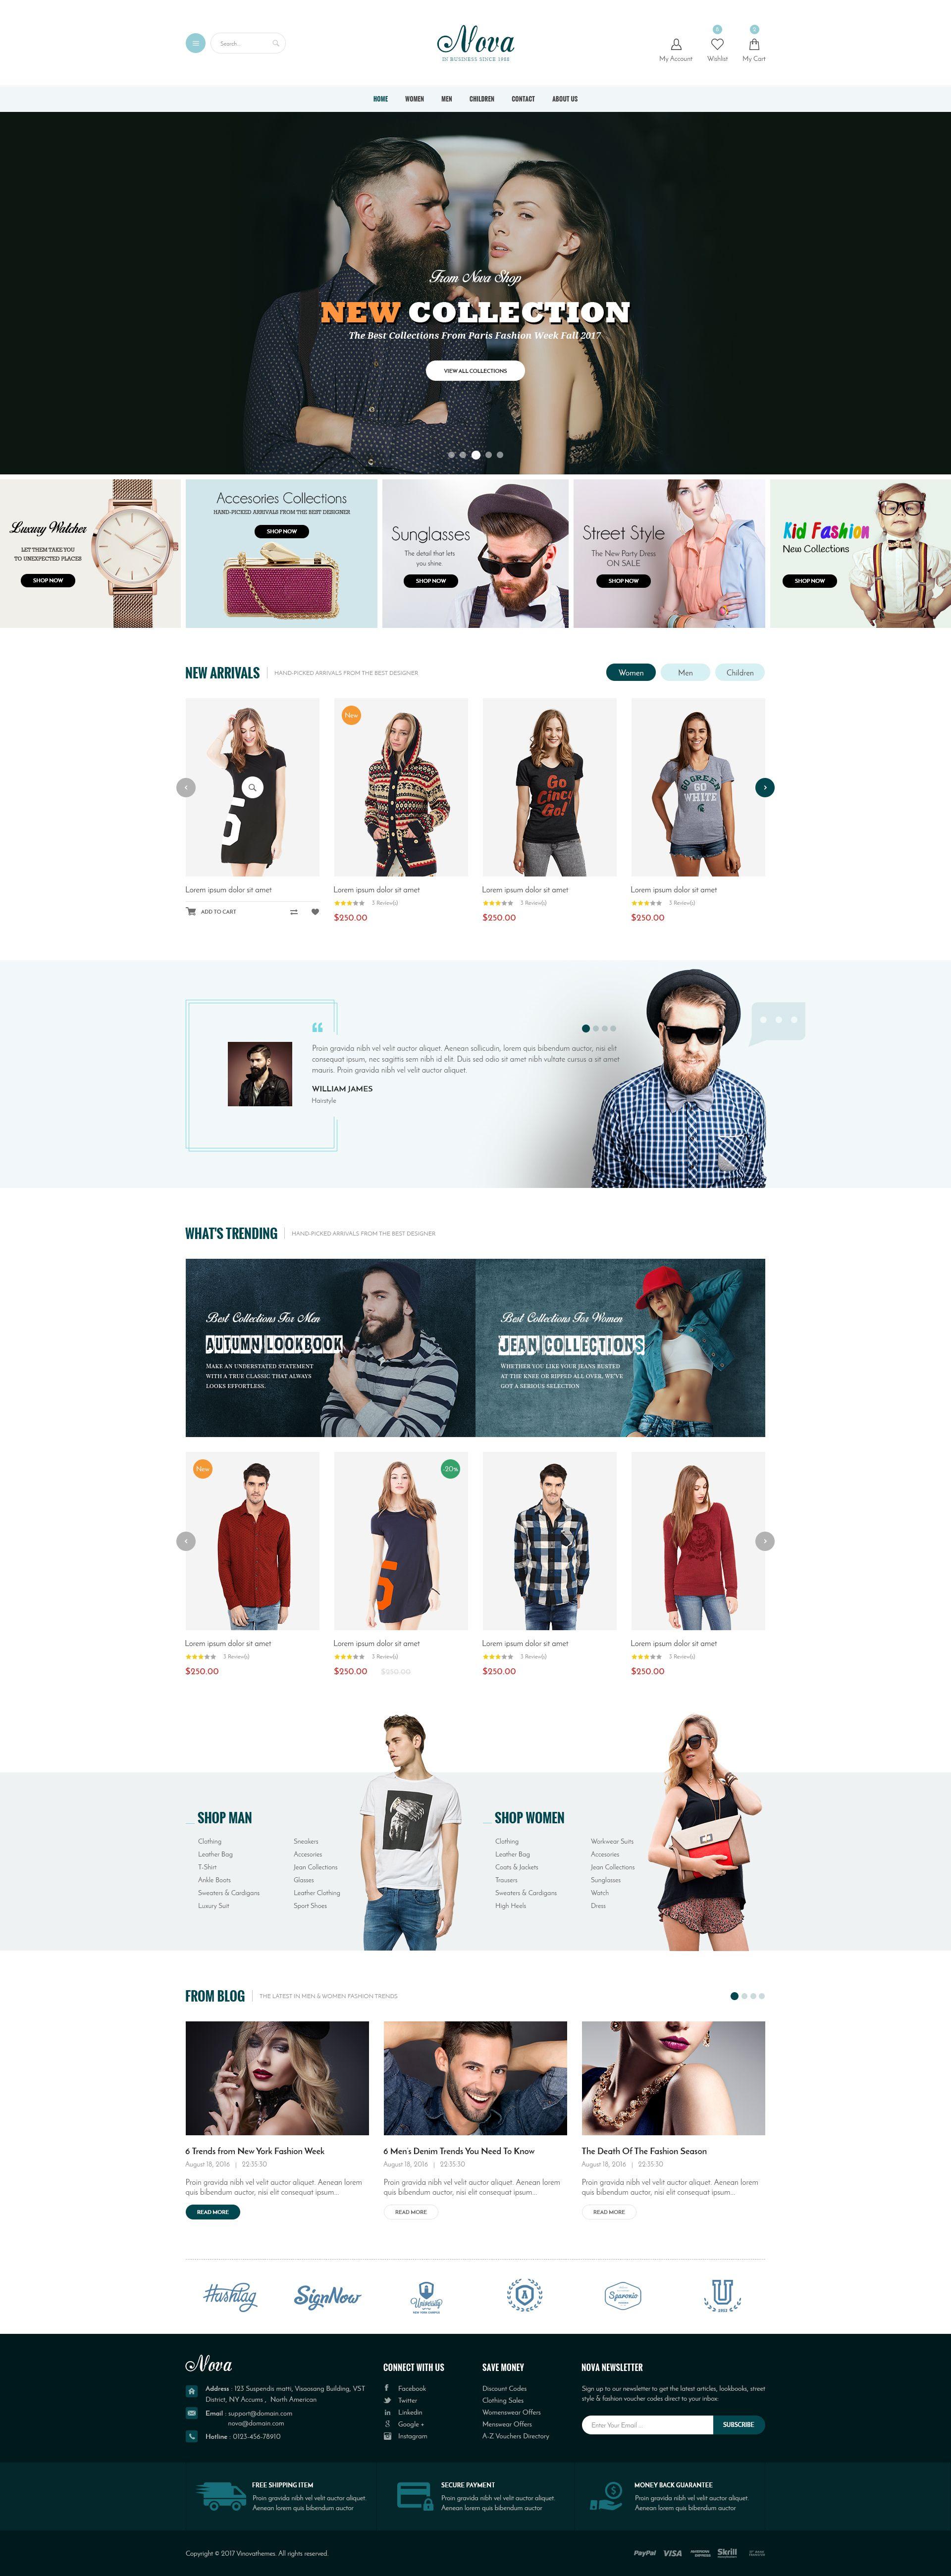 Nova Fashion, Clothing & Accessories Shopify Theme